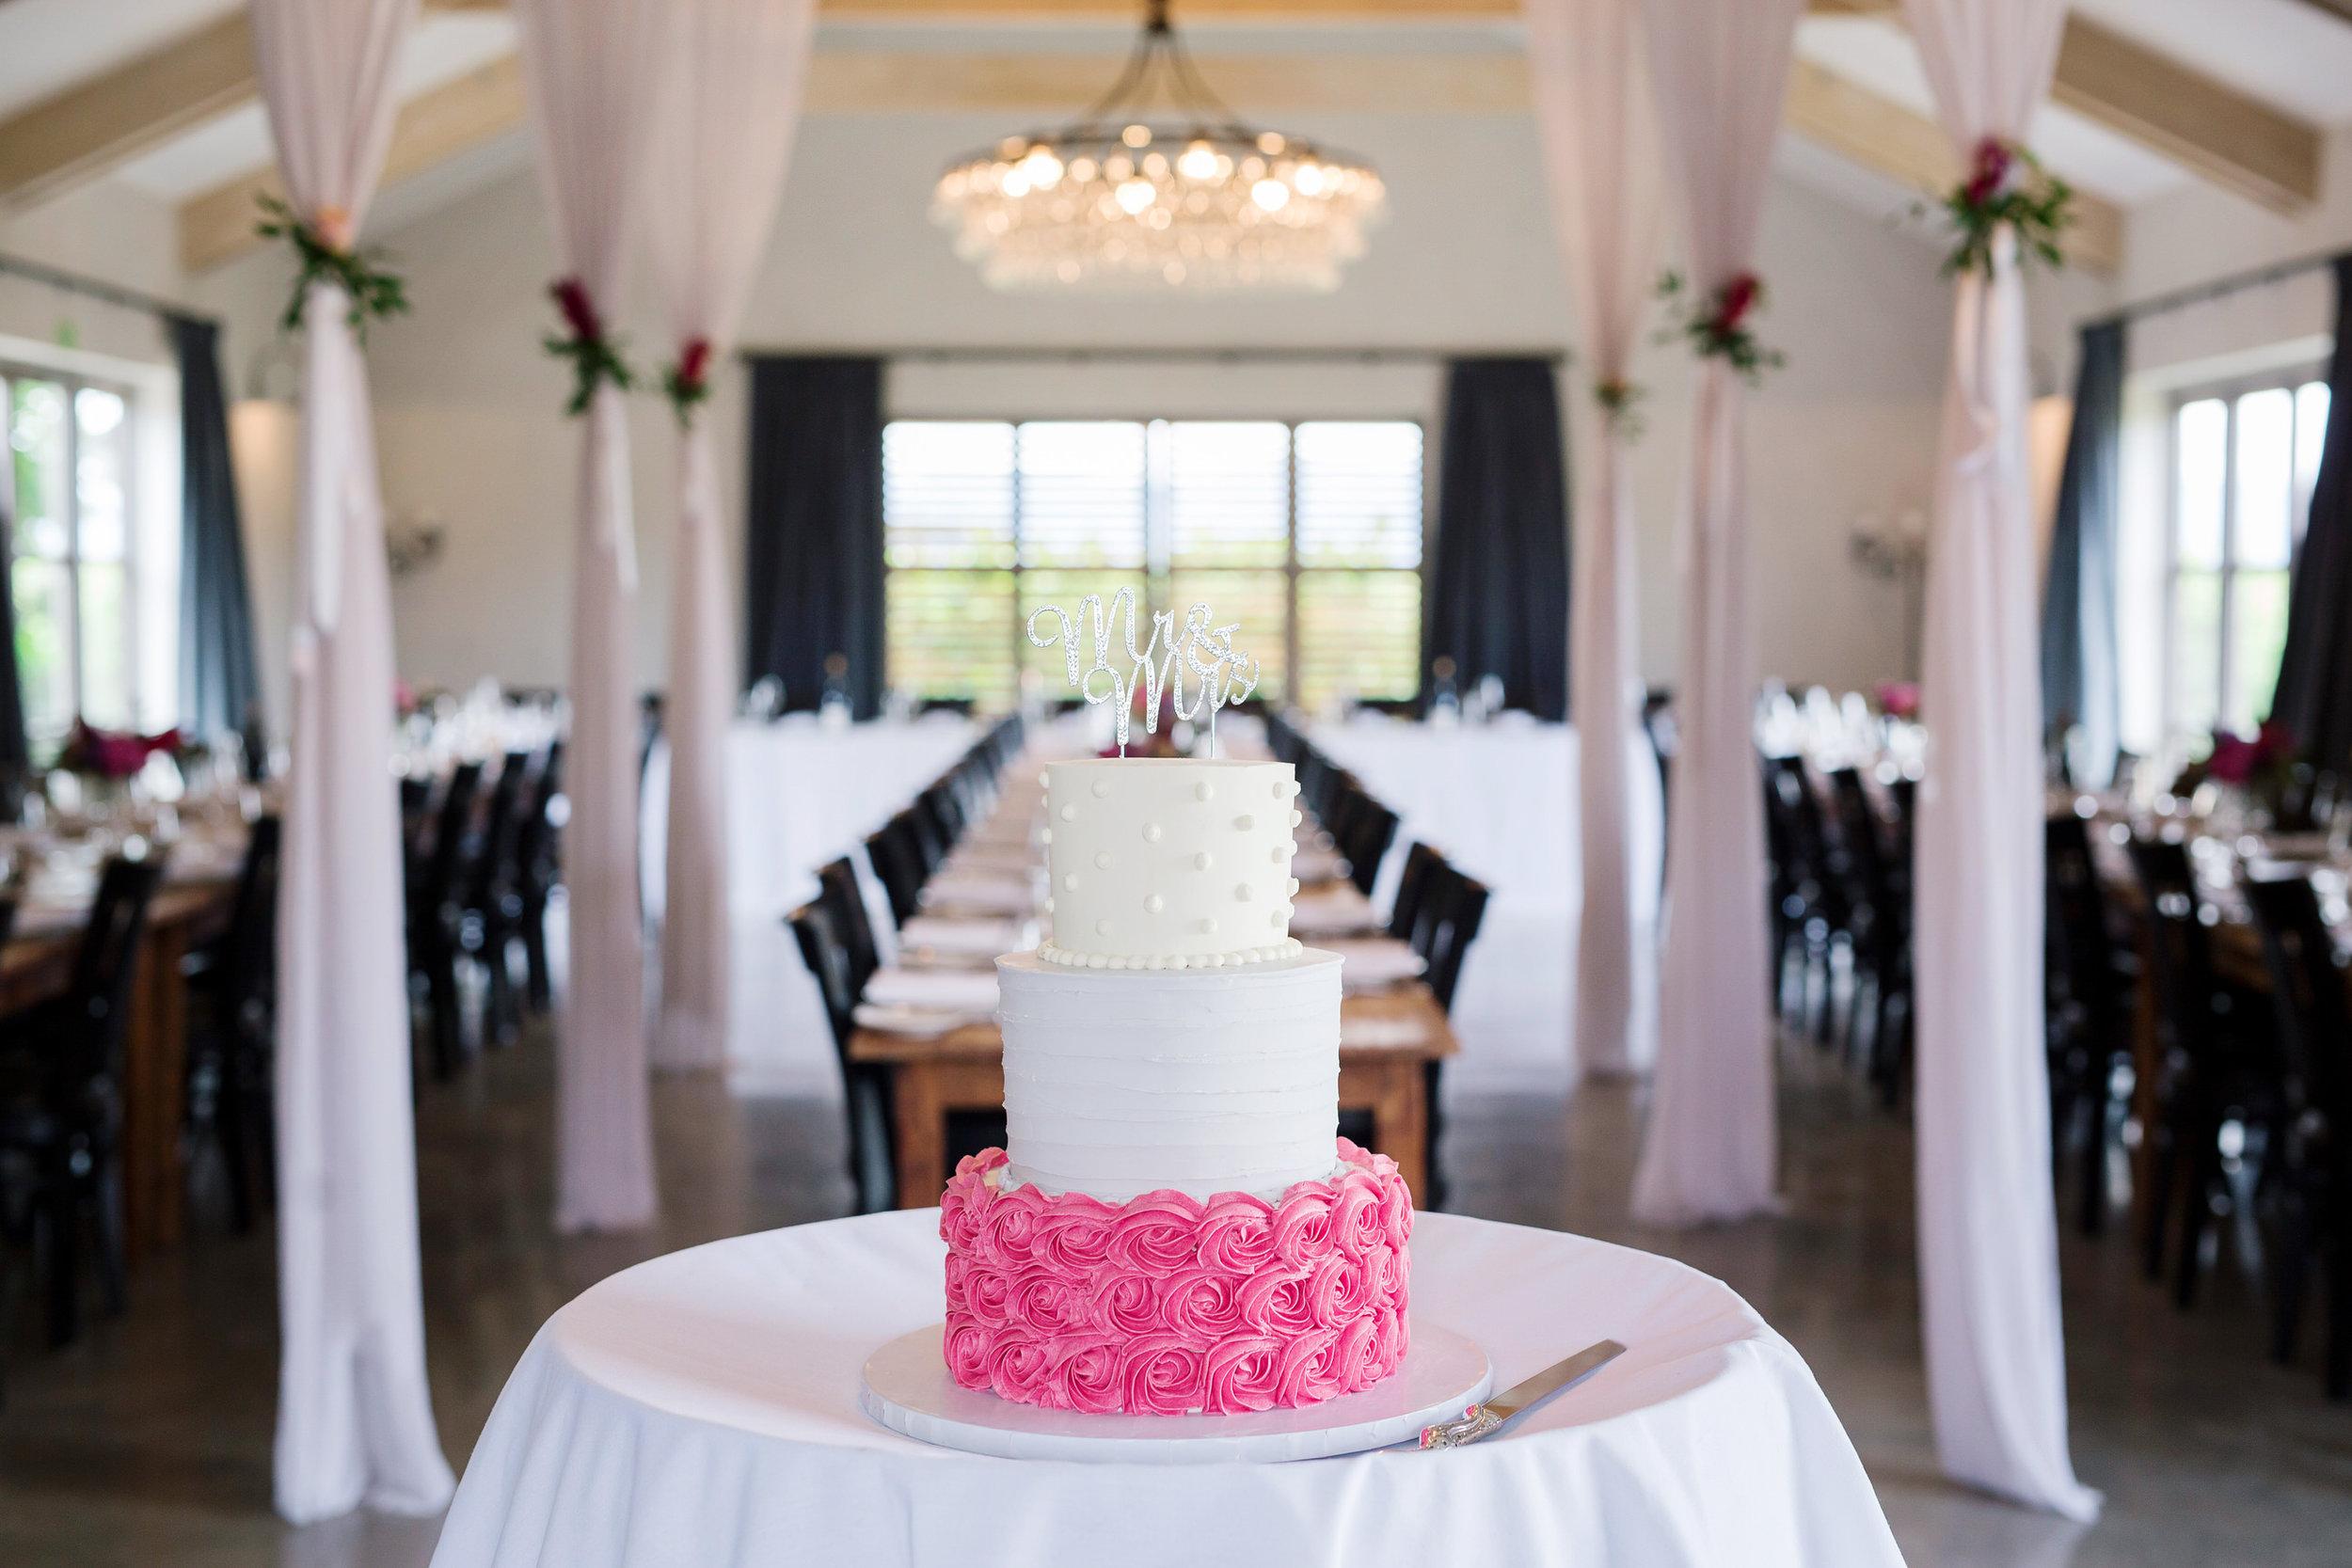 Martinborough-Poppies-Wedding-Caine-Eloise-Toni-Larsen-0122.jpg